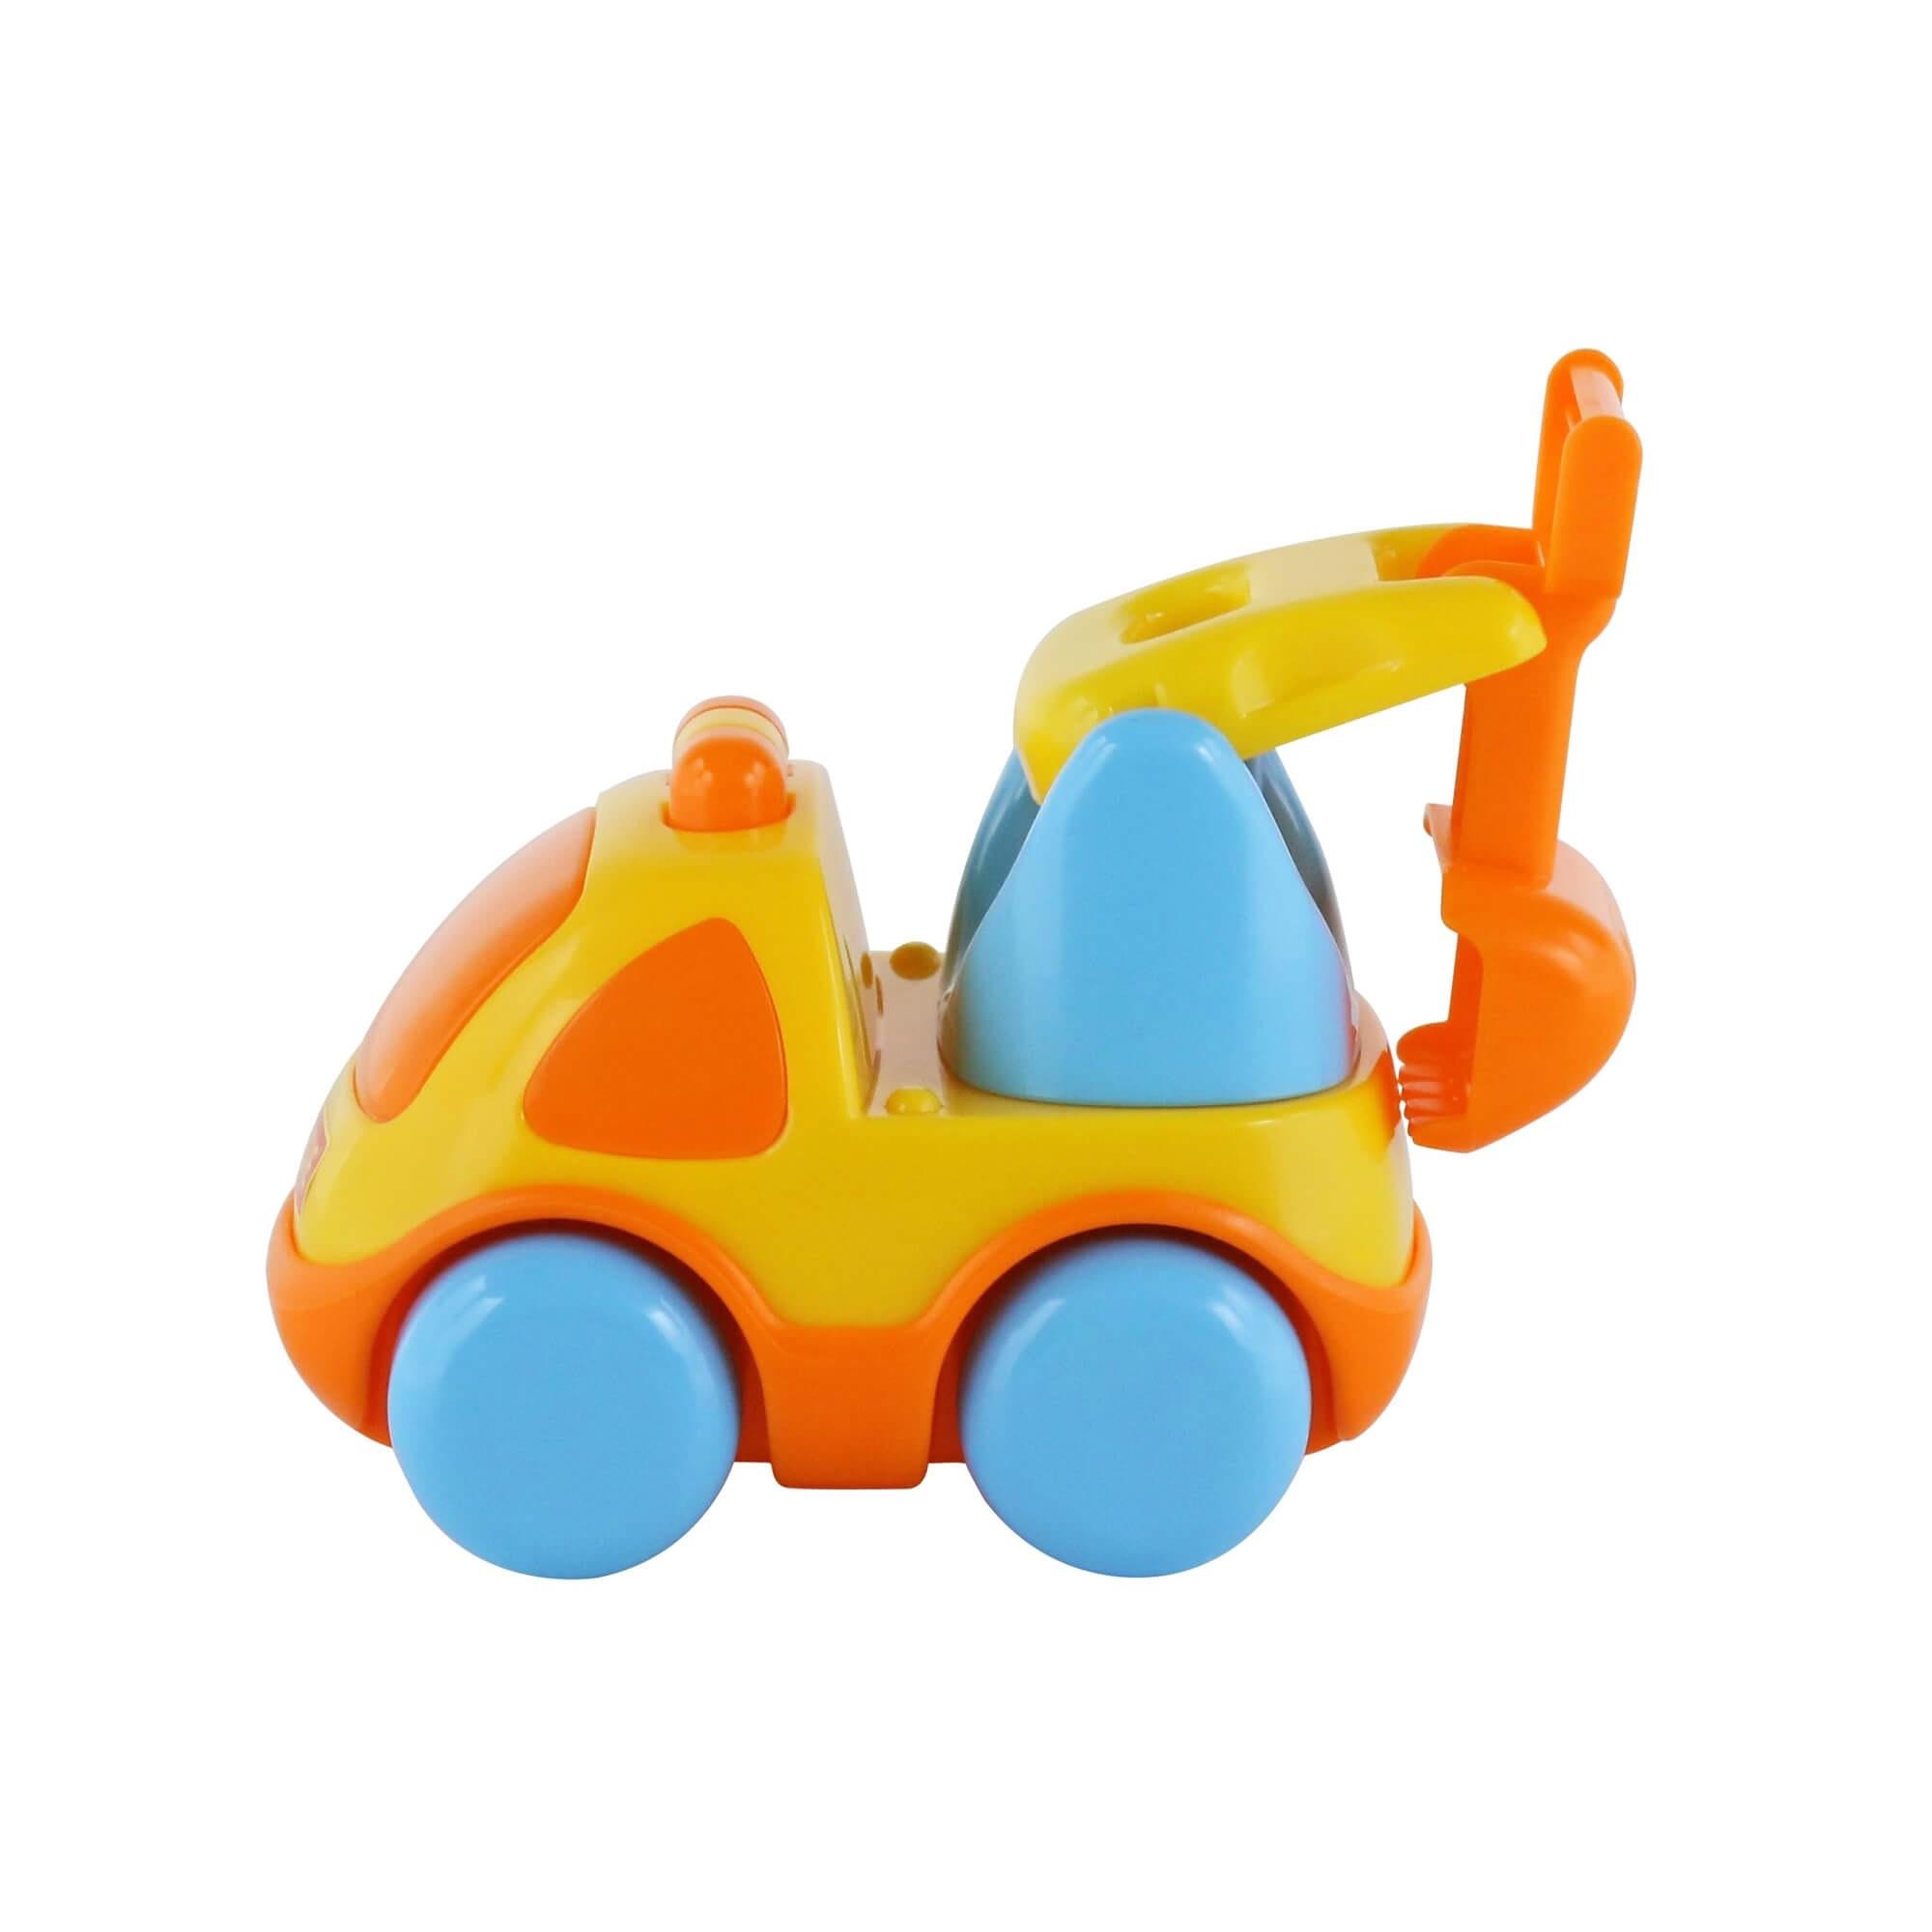 xe xúc carat đồ chơi Polesie Toys